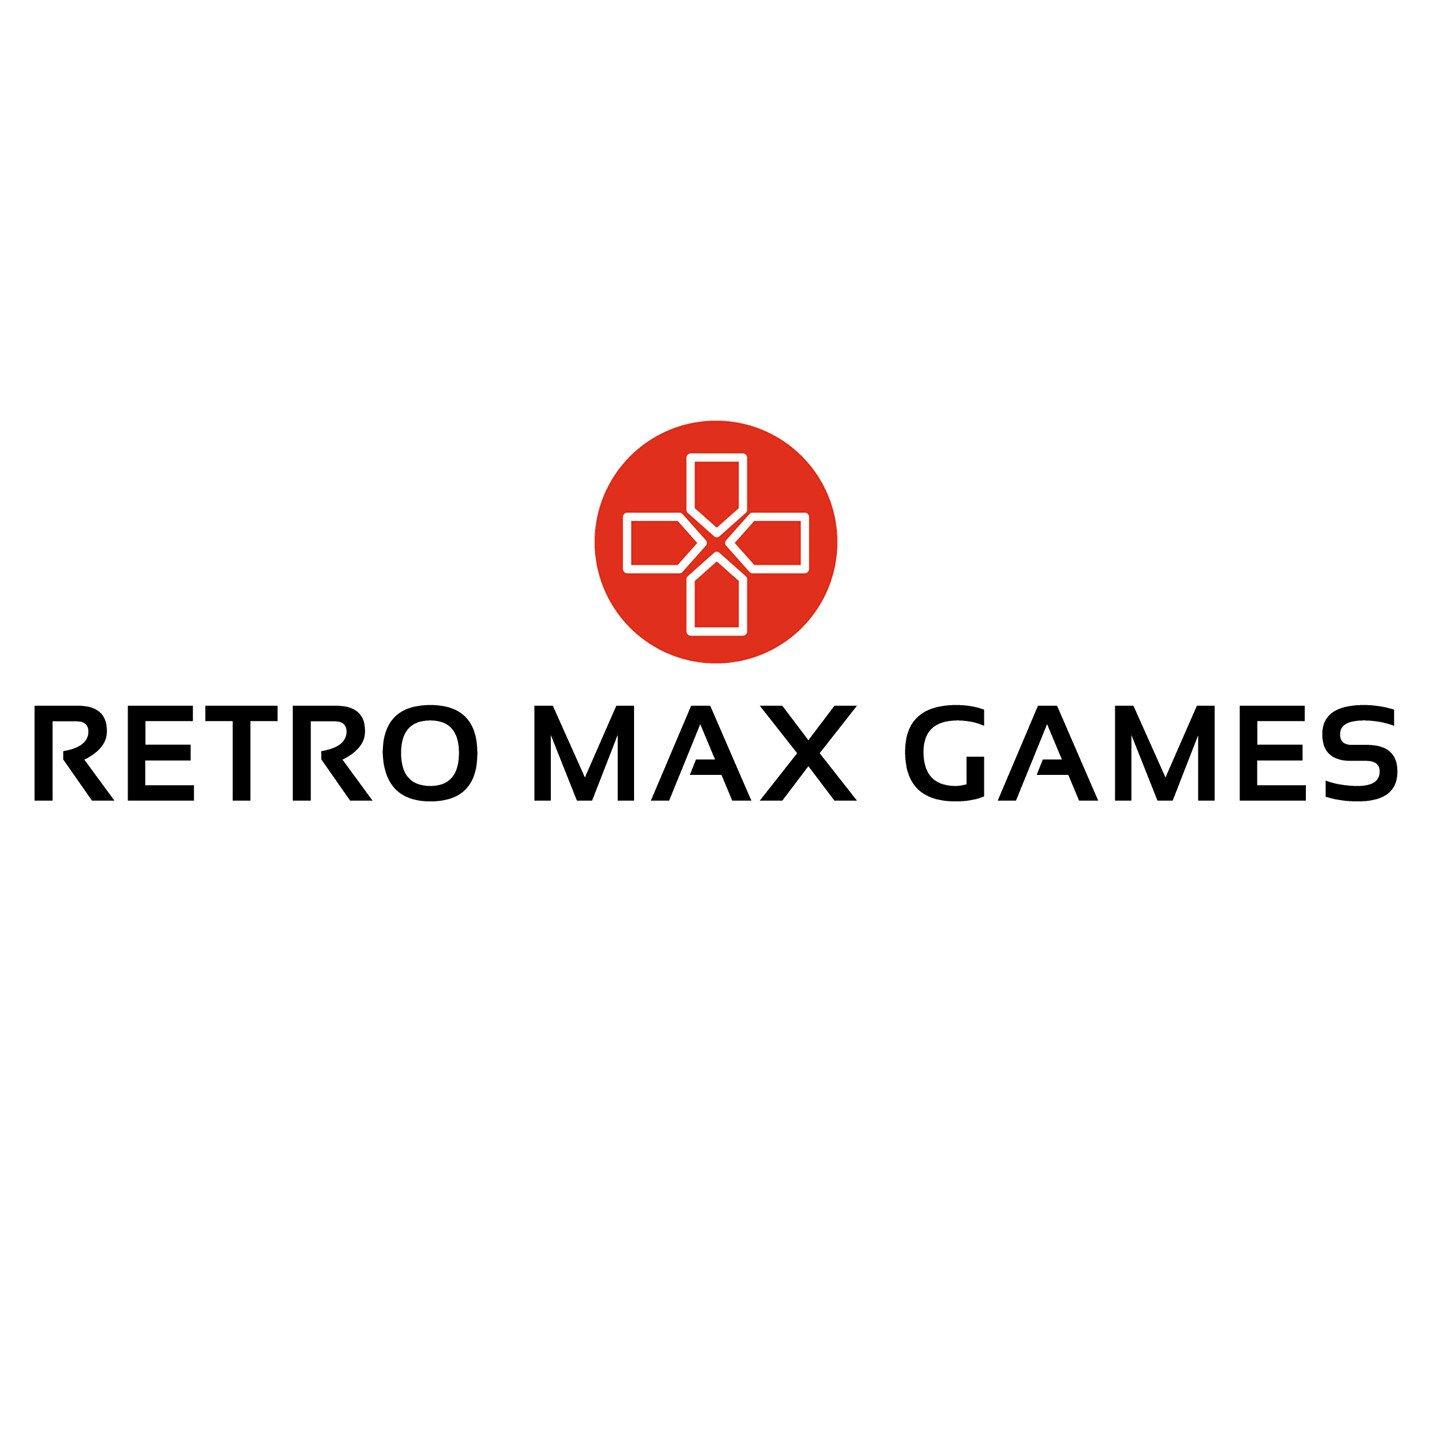 Retro Max Games